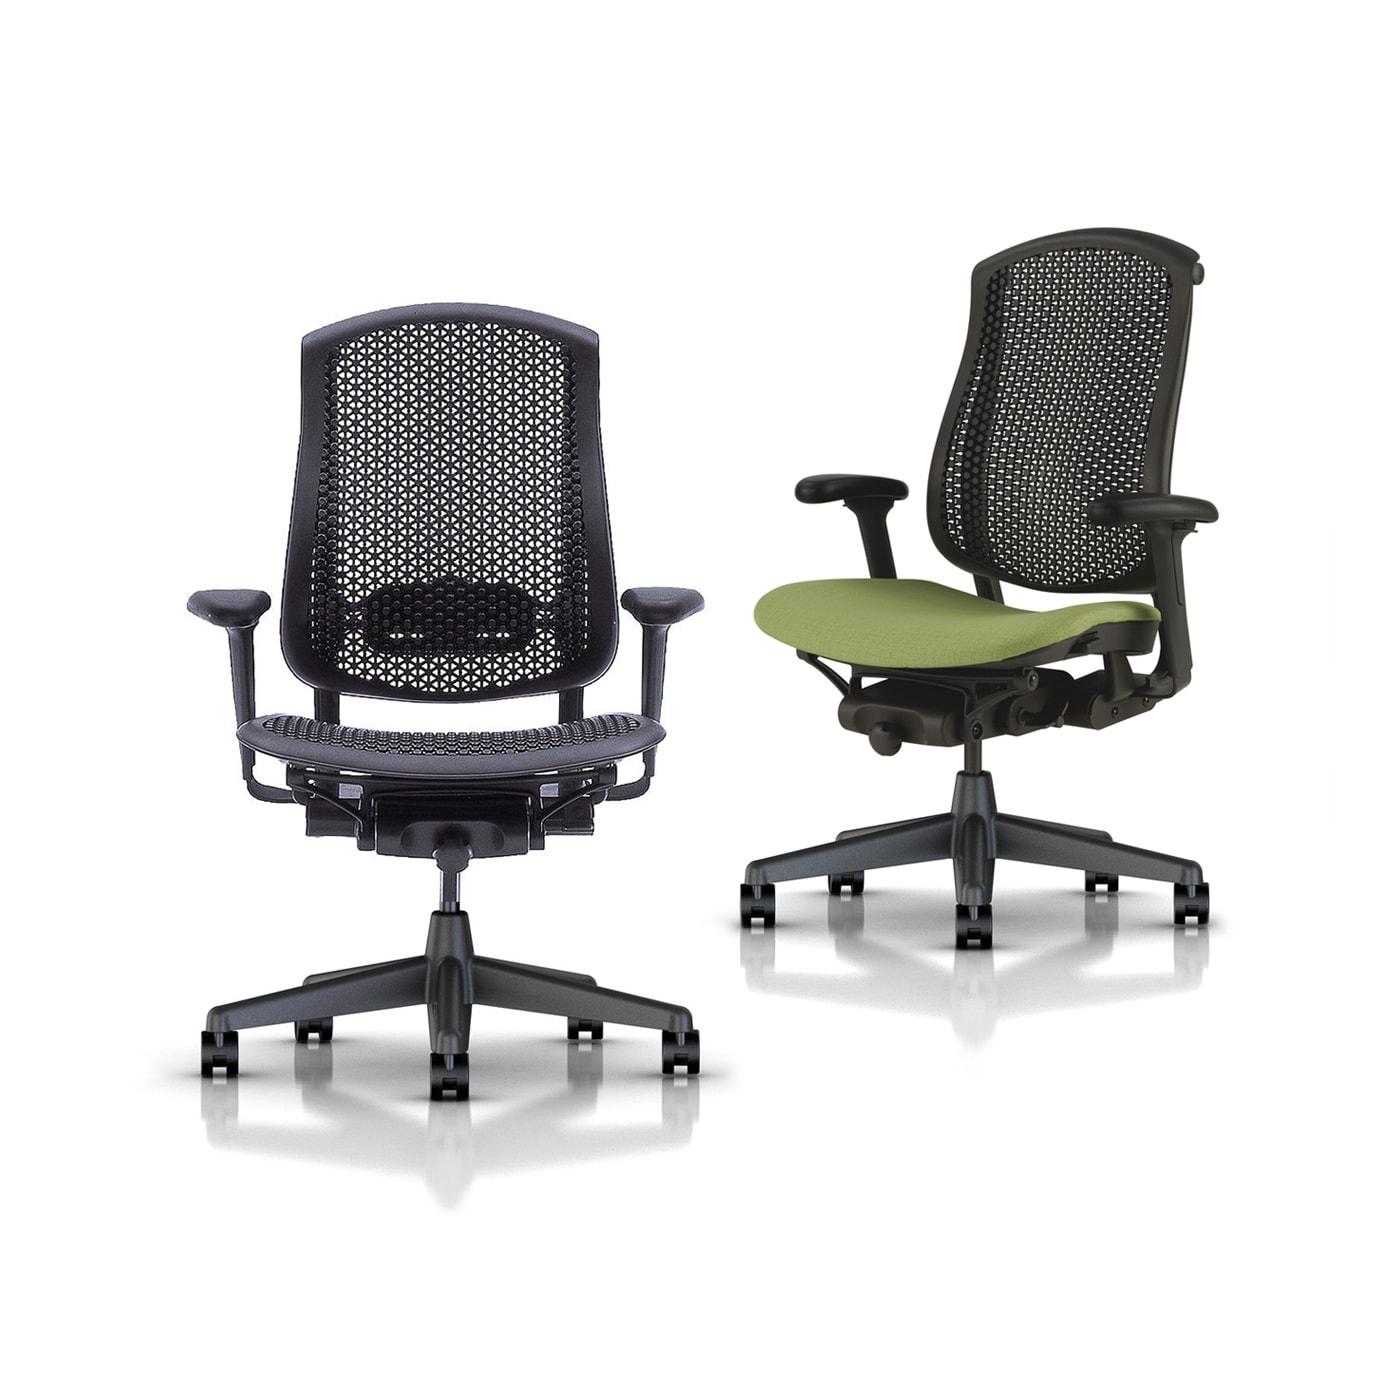 Herman Miller Celle poltrona ufficio - shop online